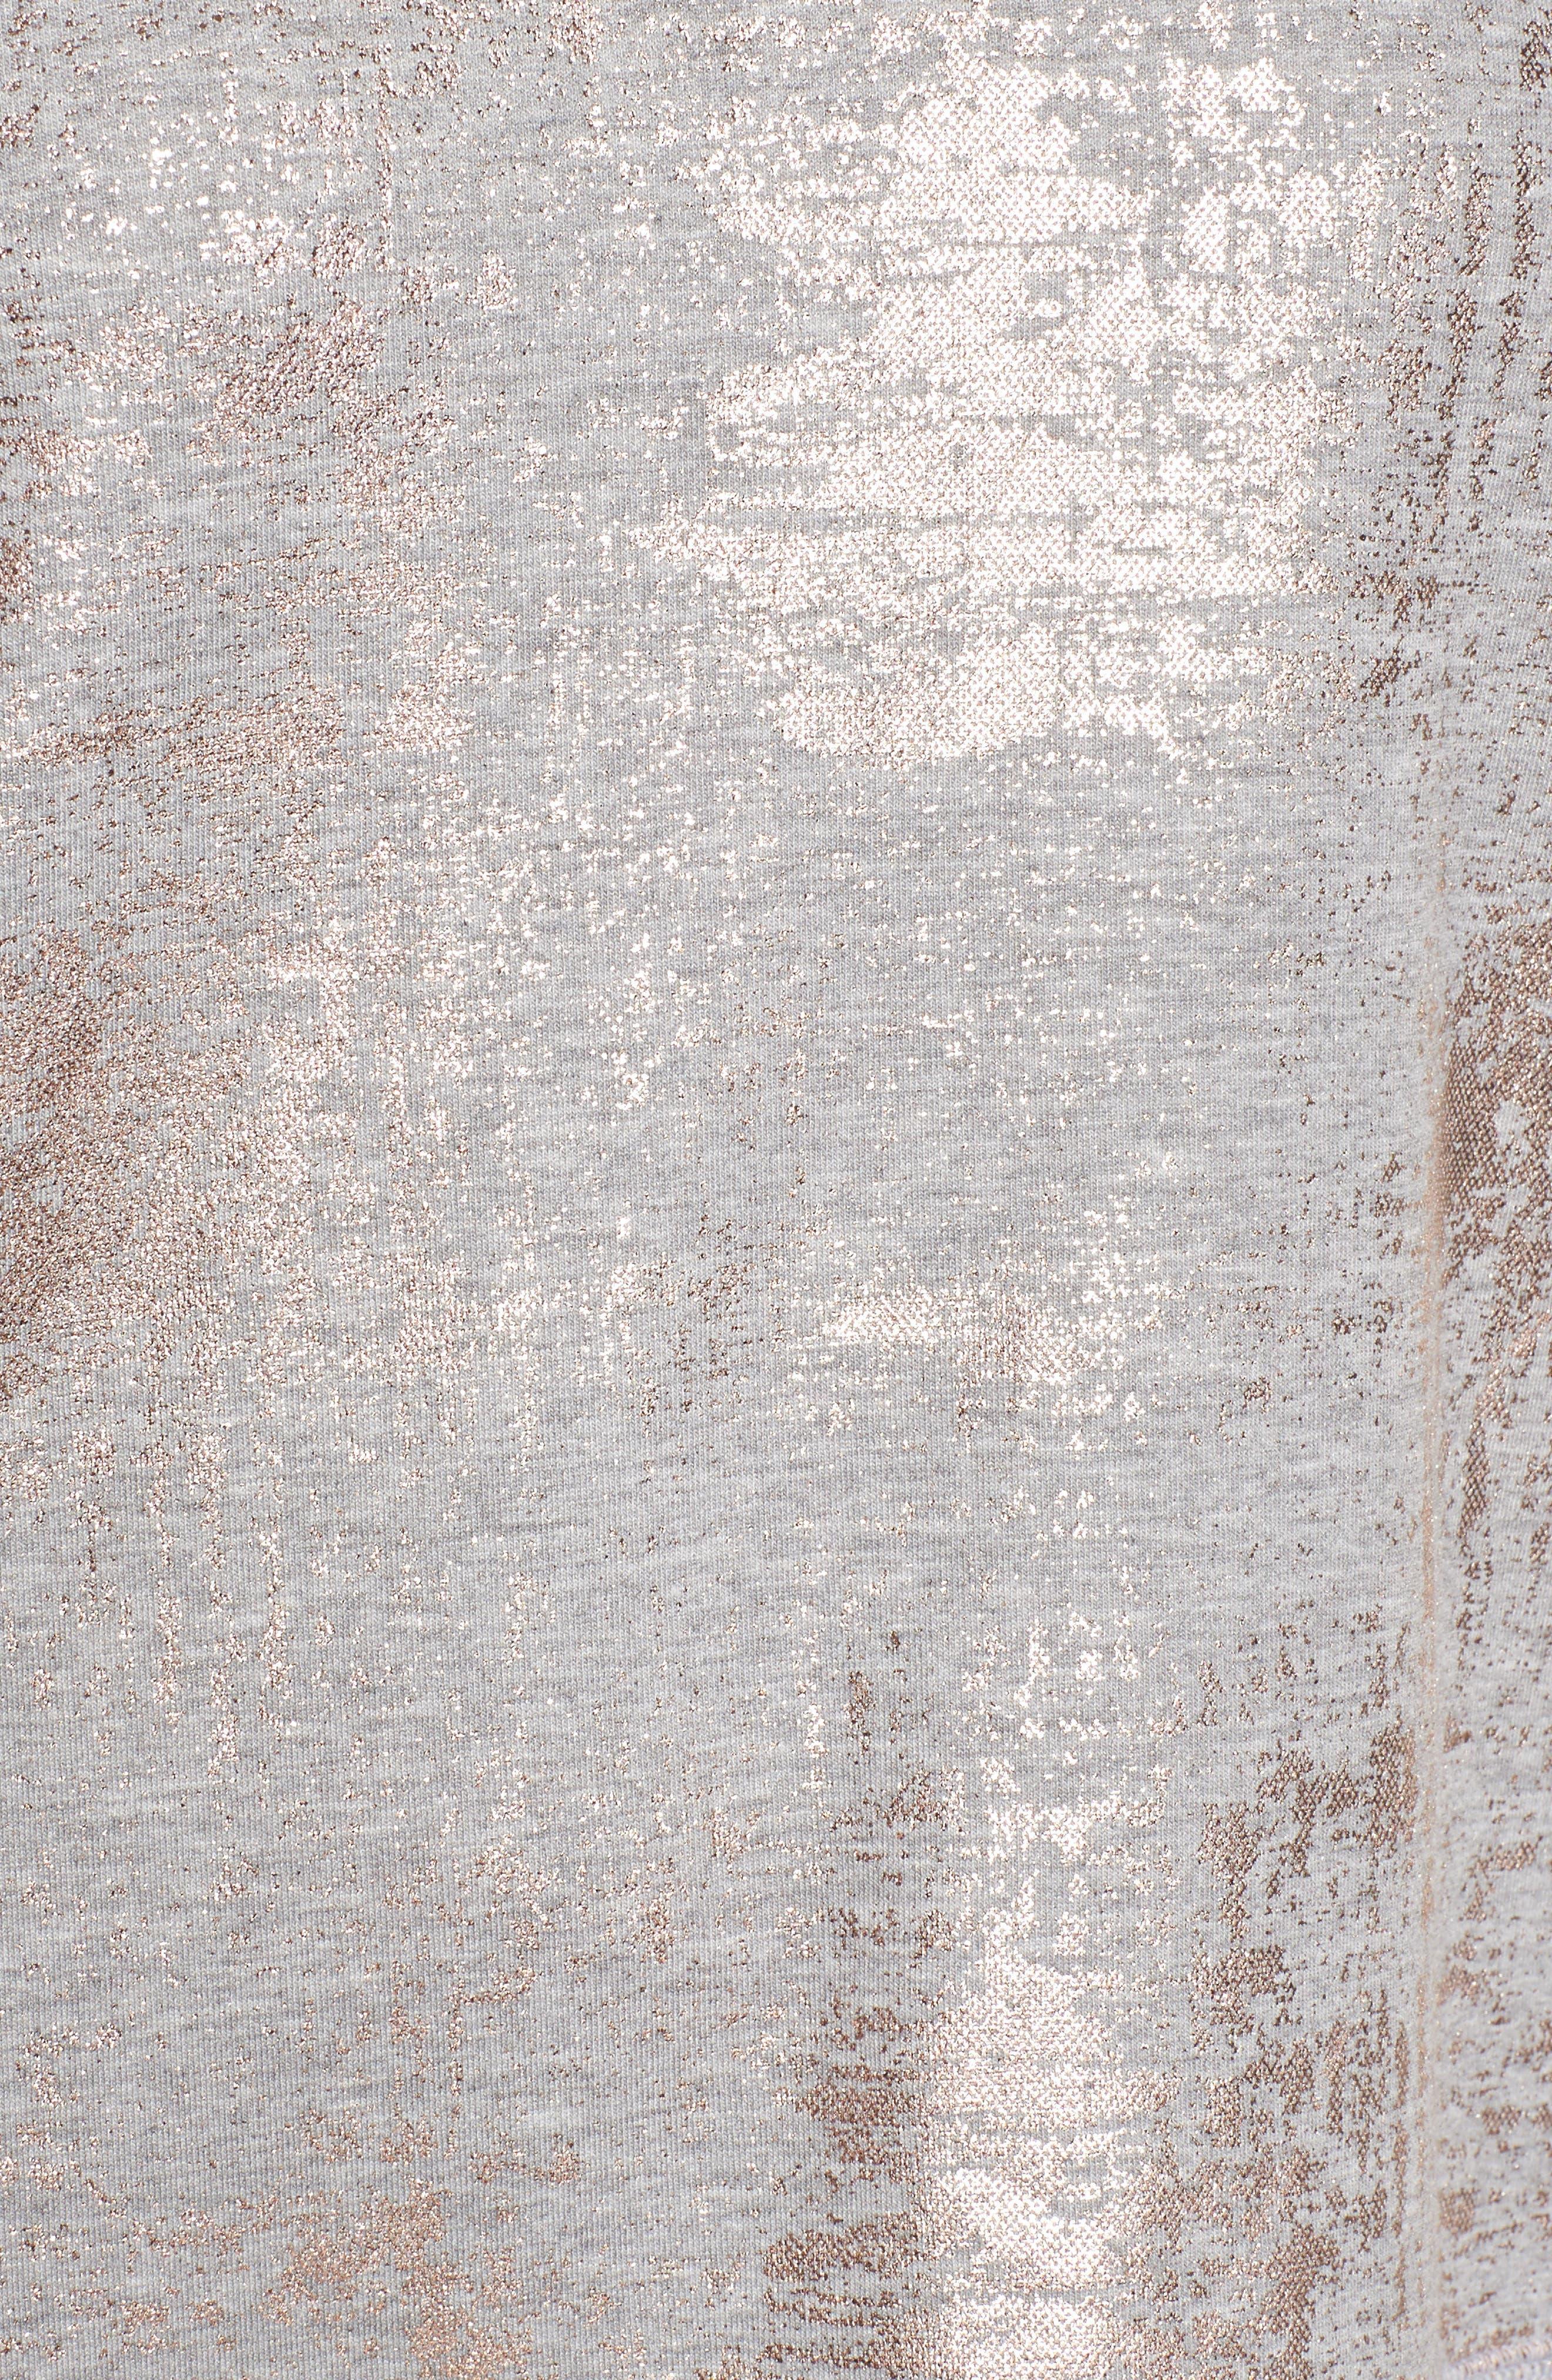 Foiled Sweatshirt,                             Alternate thumbnail 5, color,                             020